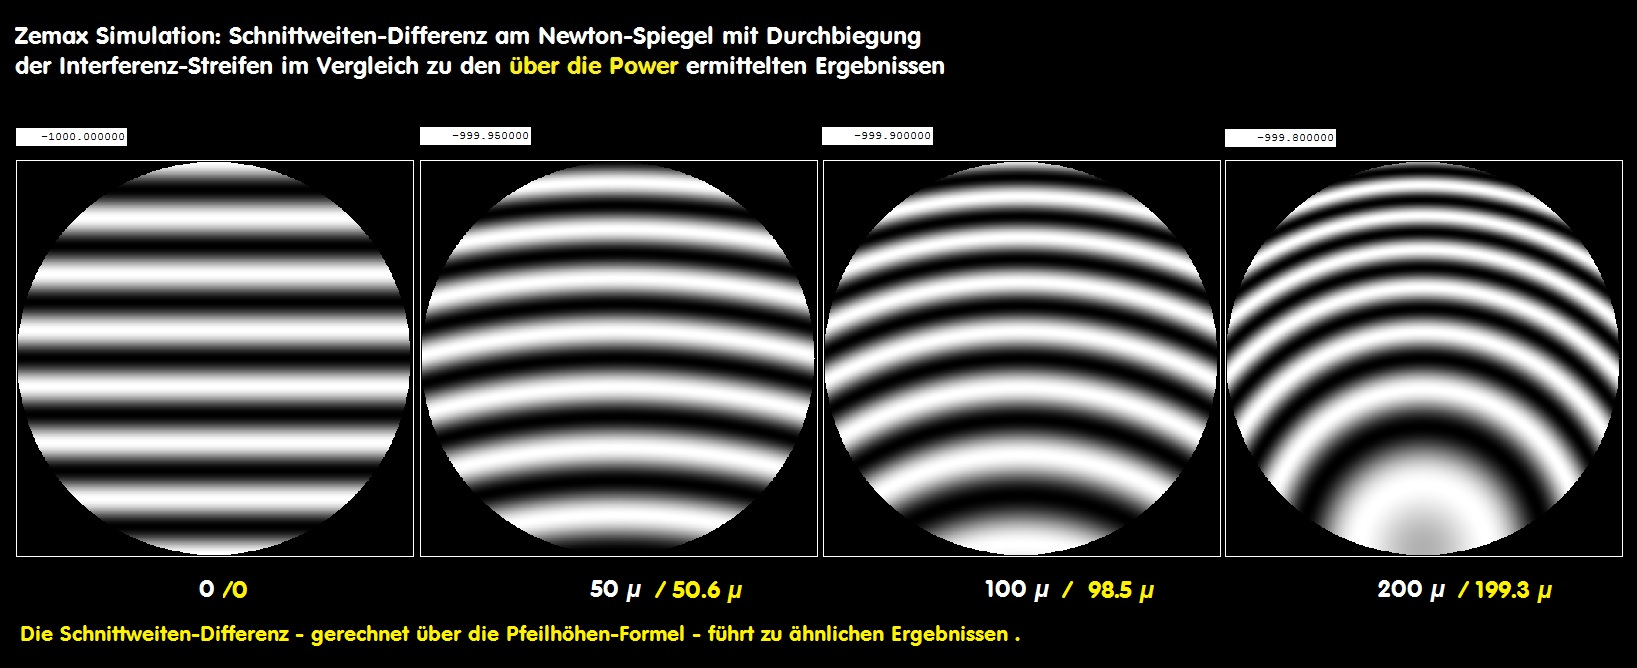 astro-foren com - 06 Messtechnik - Teil 2/Aufbau diverser Interferometer